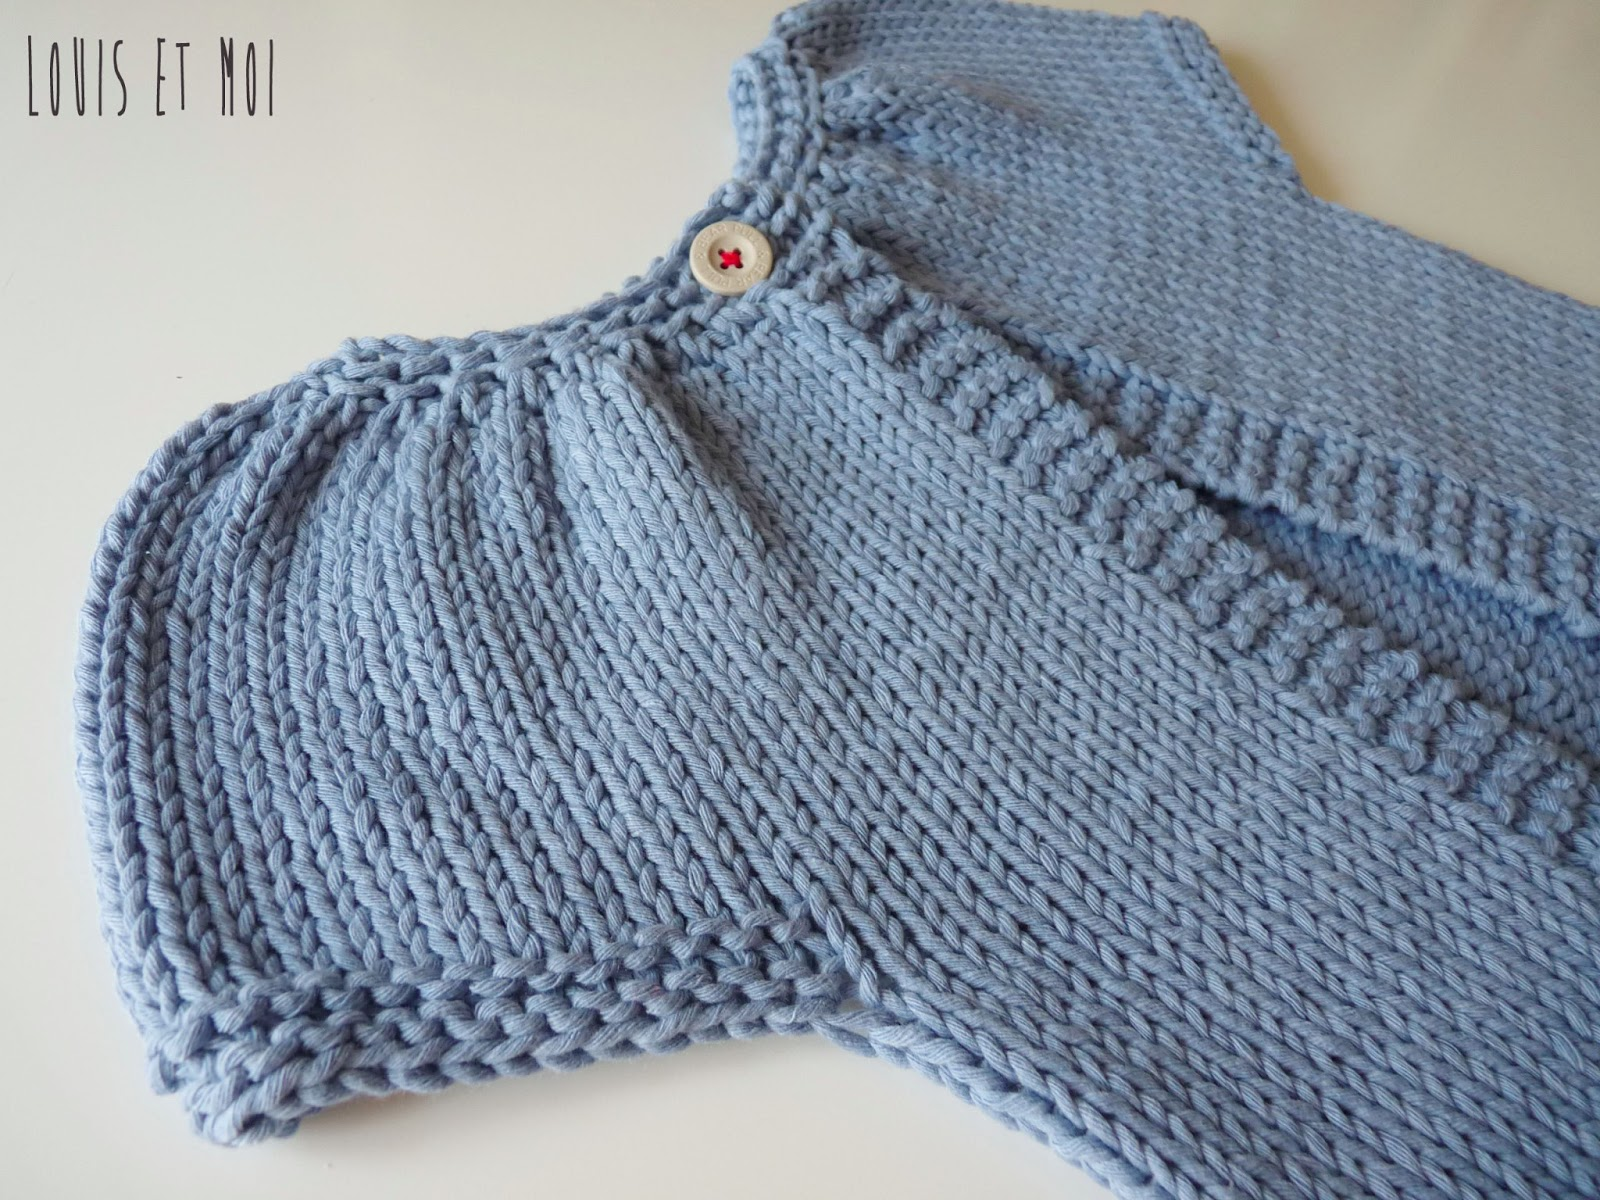 Louis et Moi (cosen y hacen crochet): julio 2013